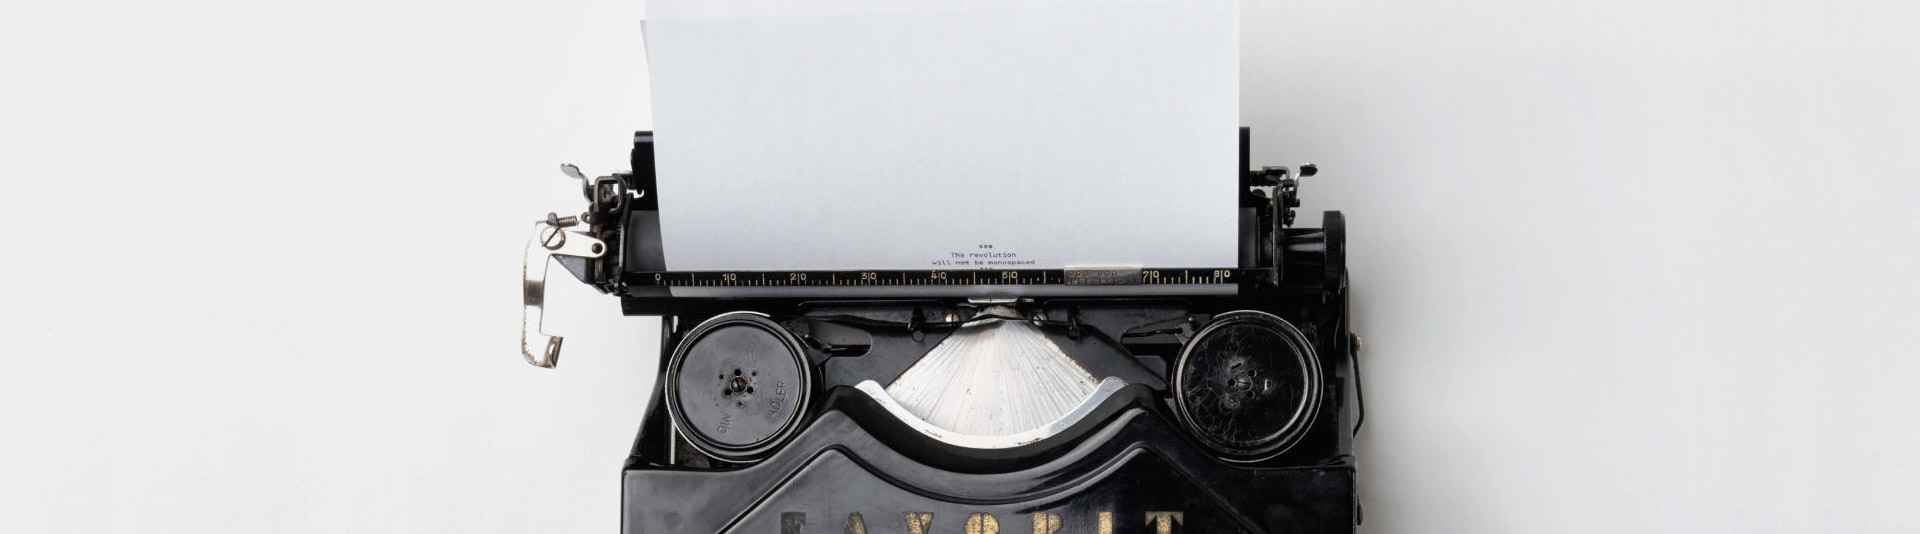 olden typewriter